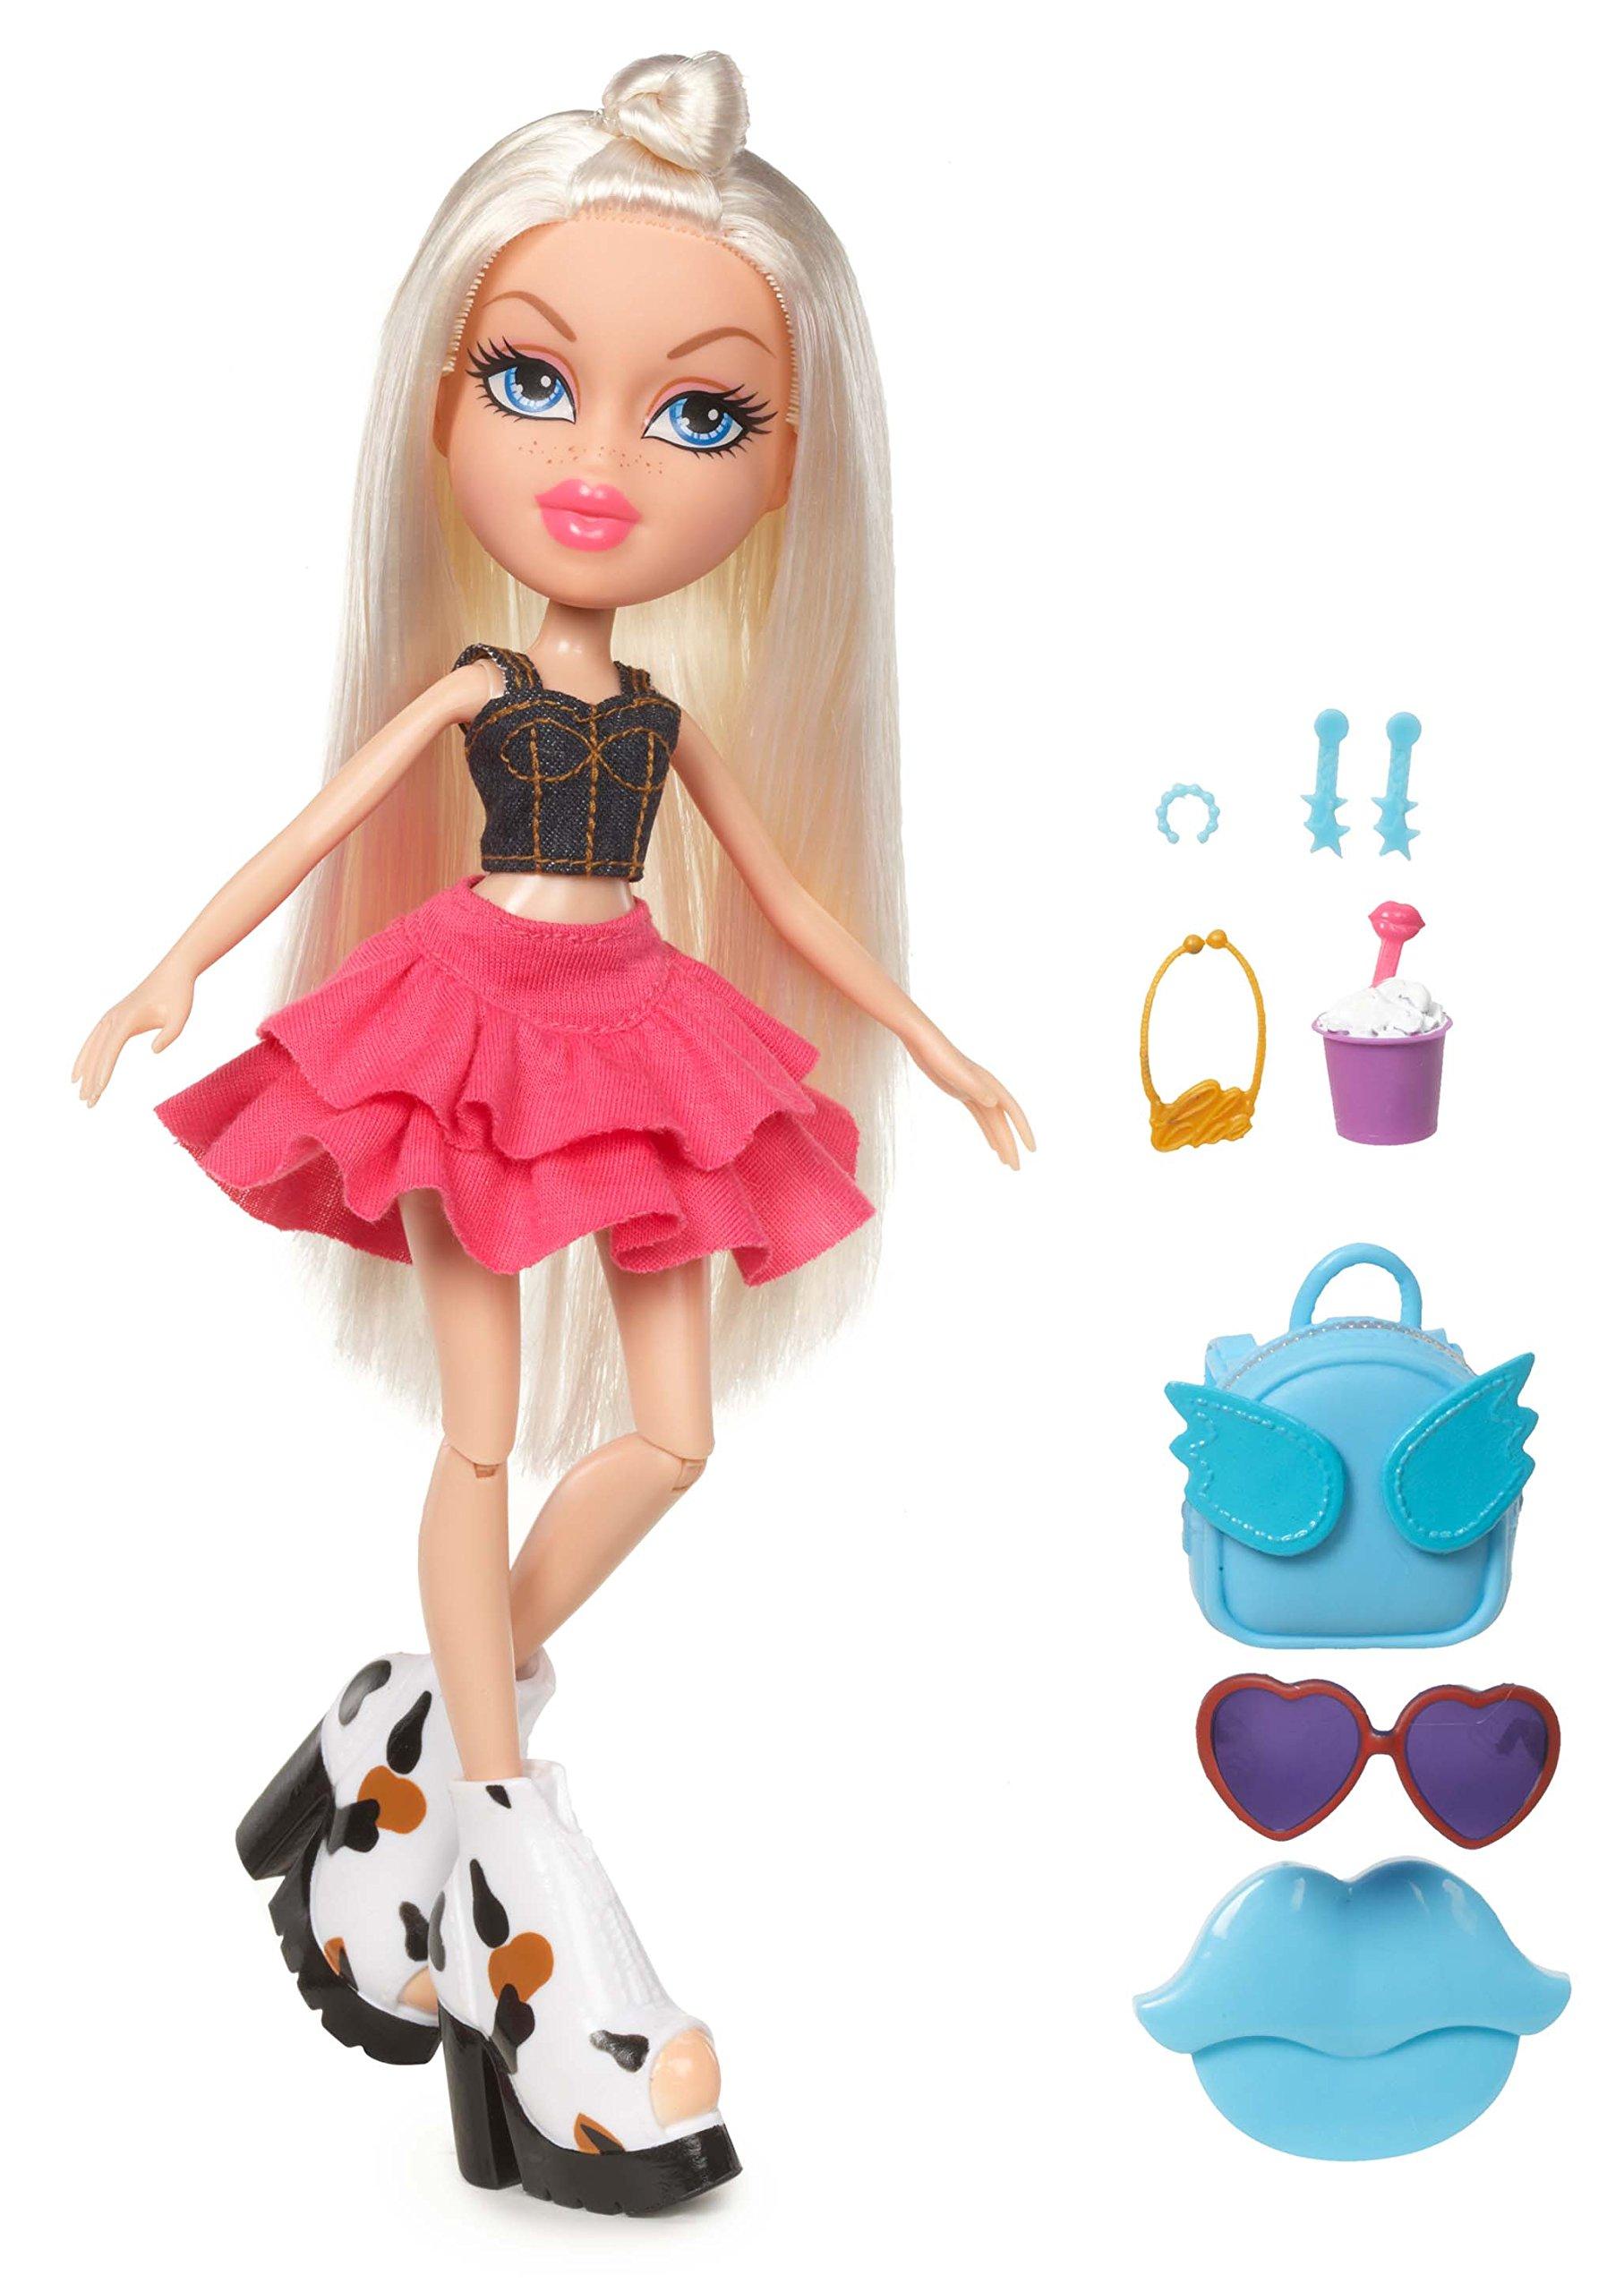 Bratz Hello My Name Is Cloe Doll | eBay